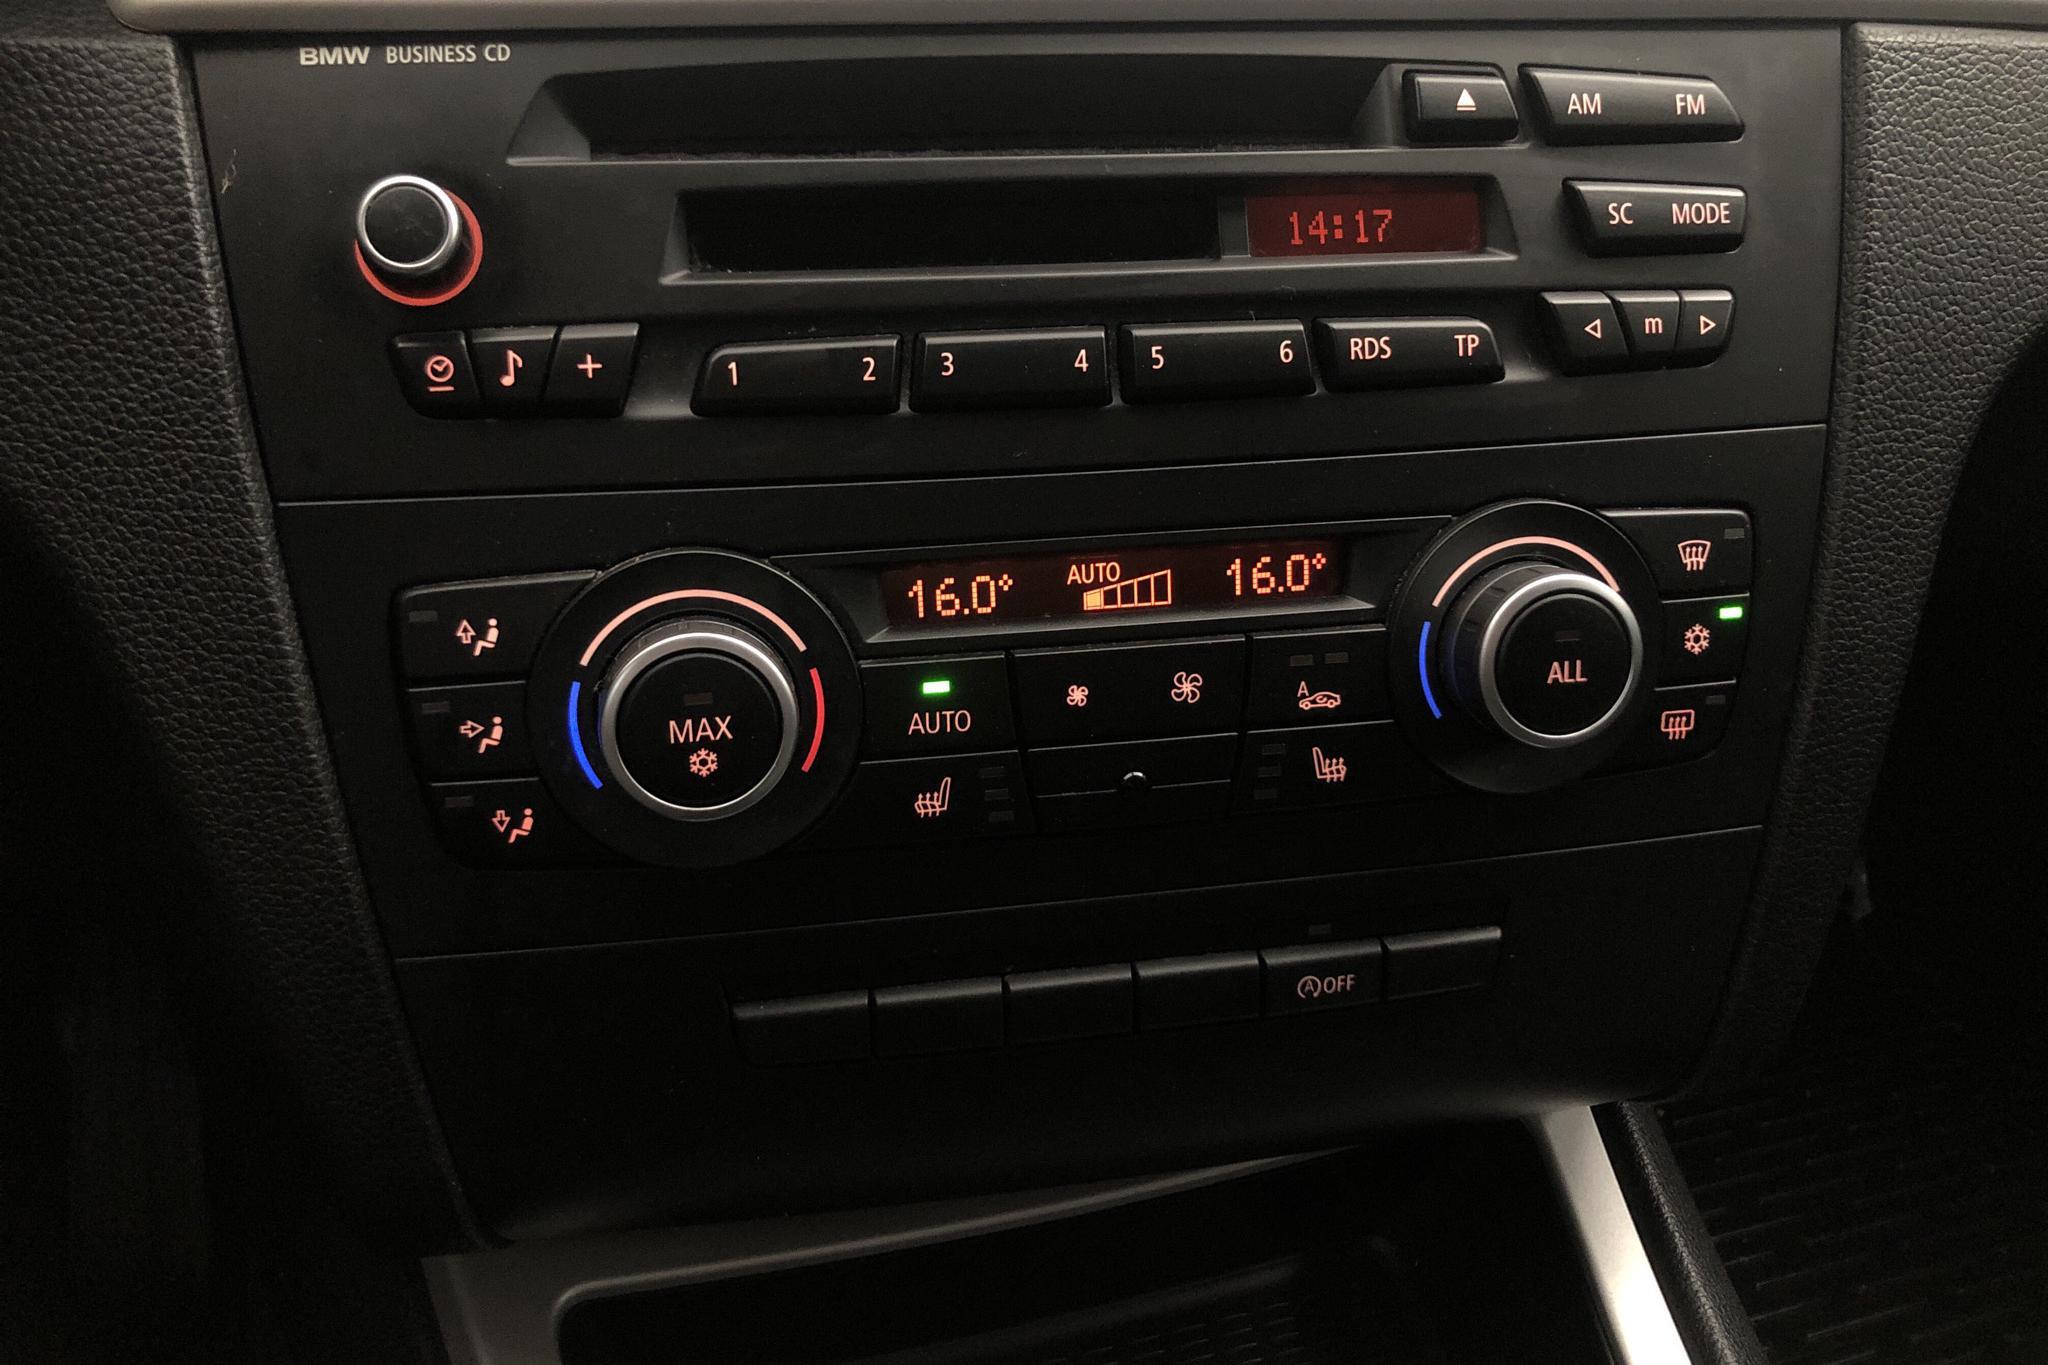 BMW 118d 5dr, E87 (143hk) - 7 891 mil - Manuell - grå - 2011